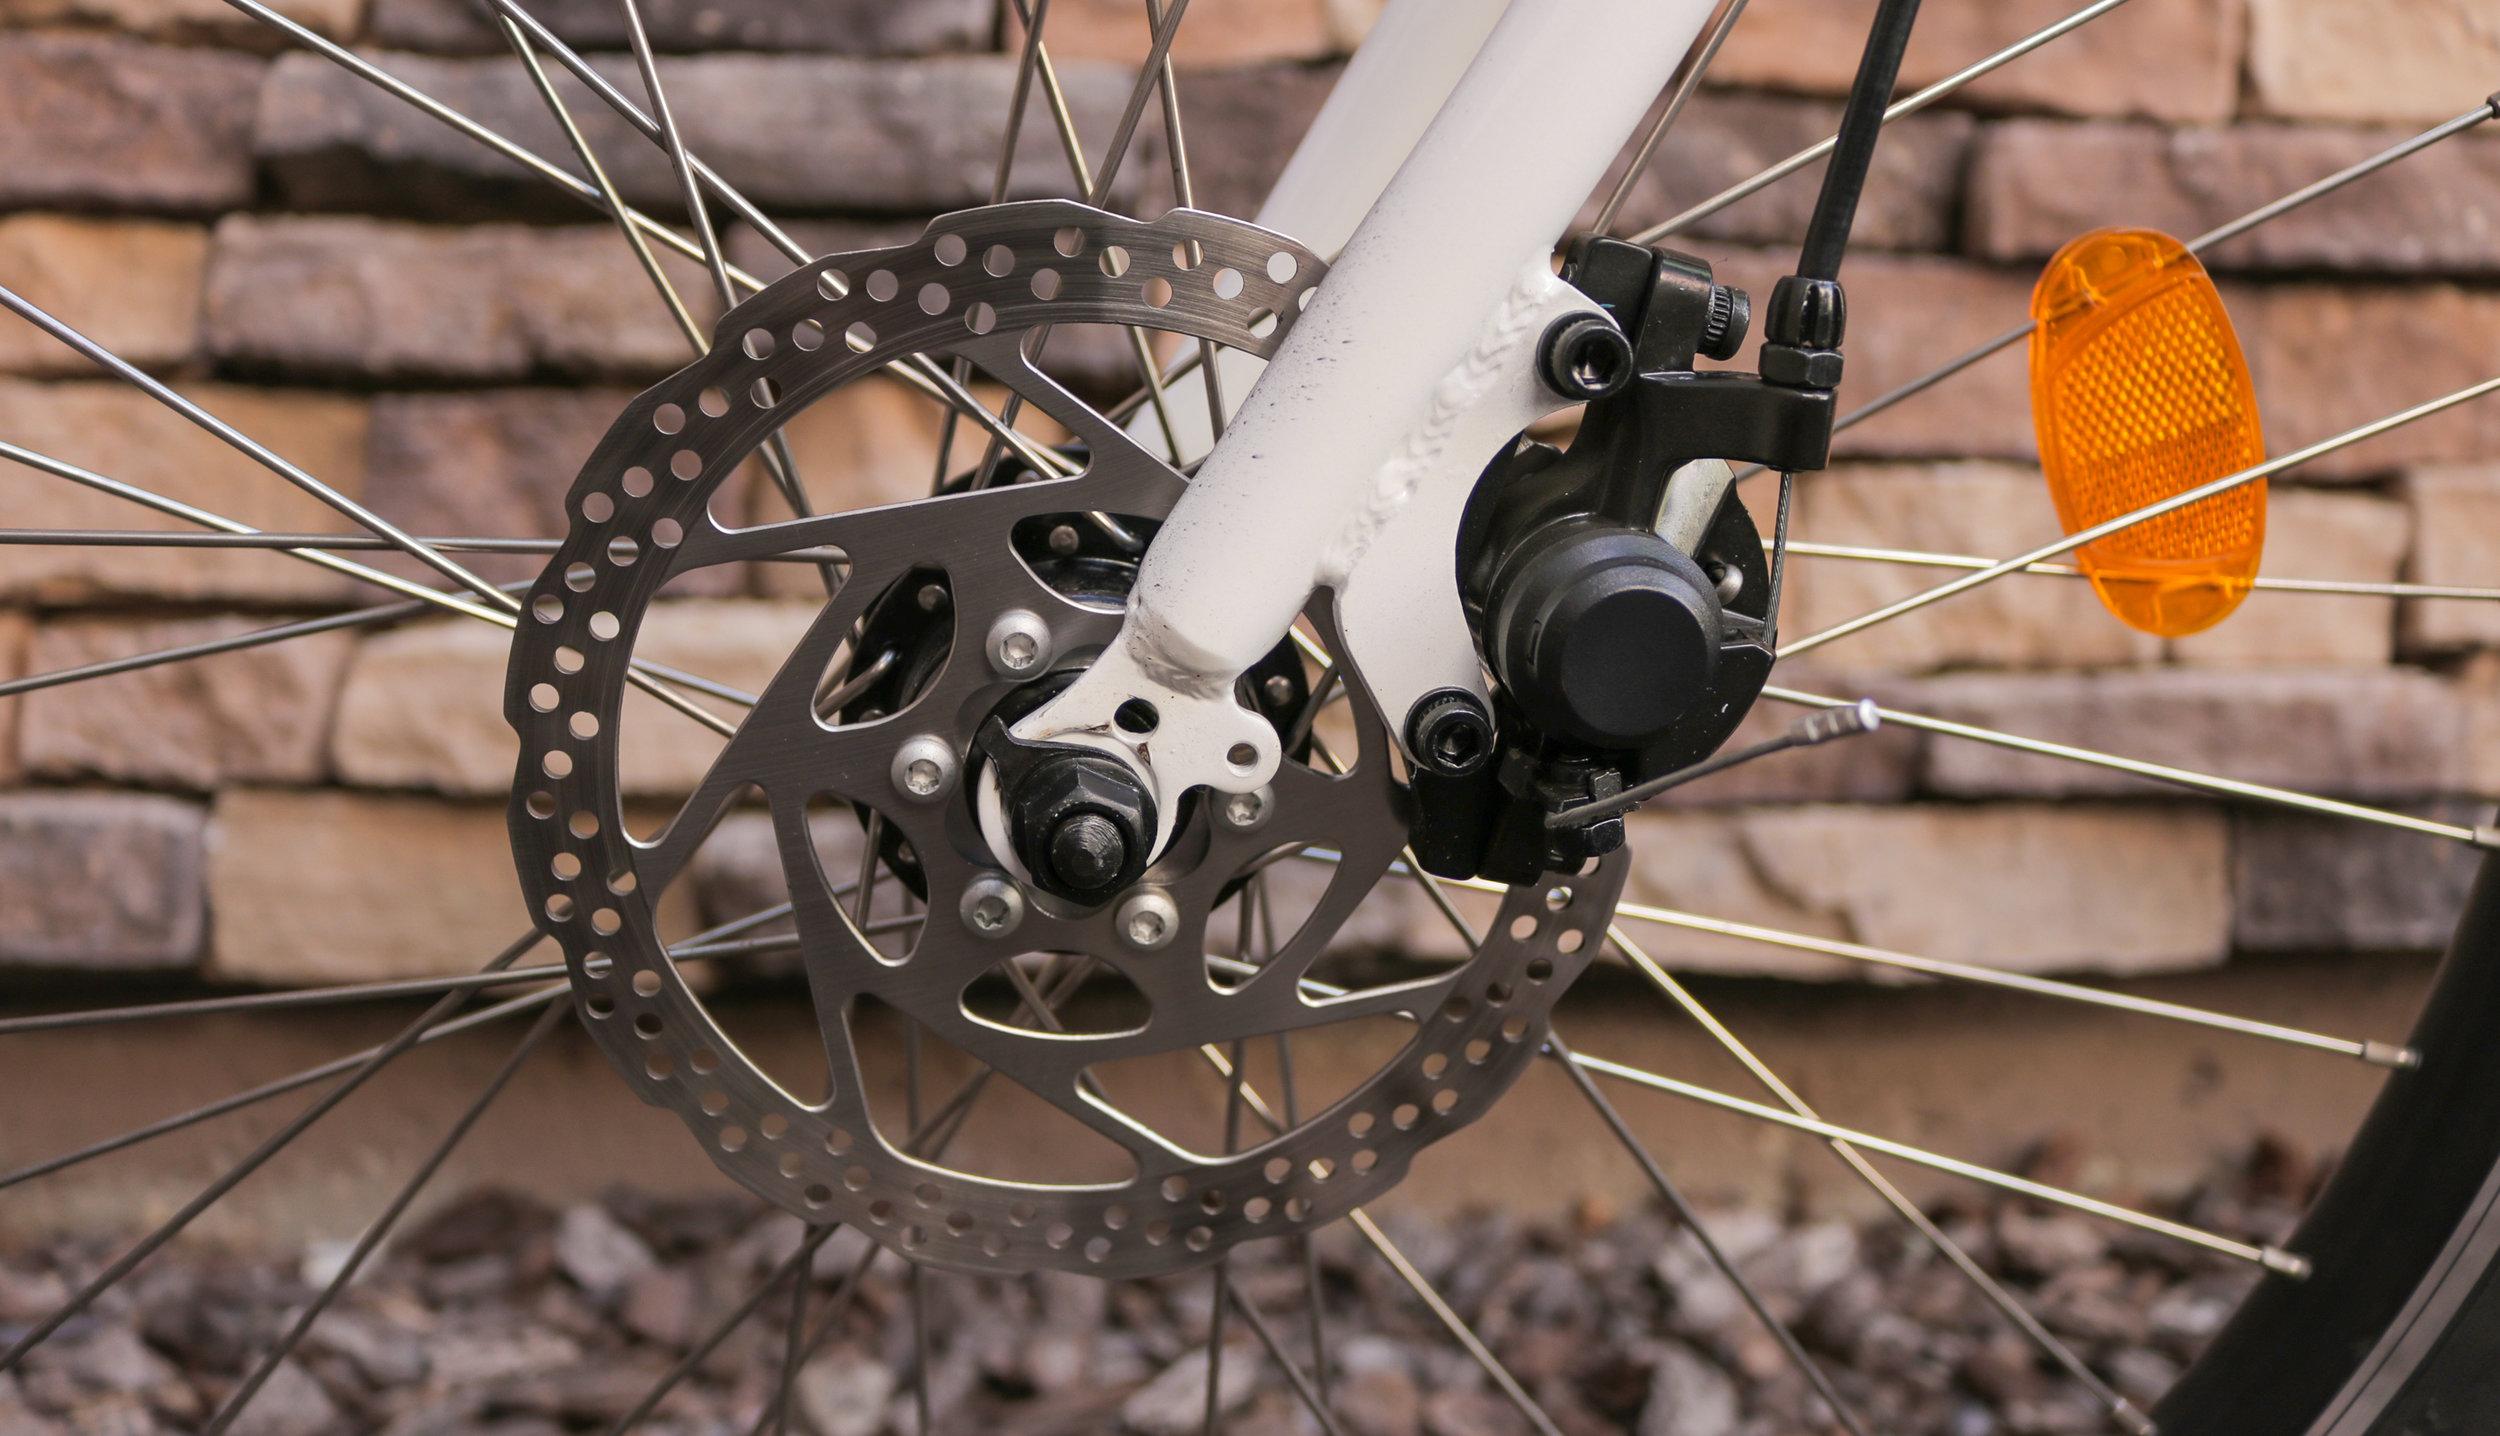 electrified-reviews-wave-electric-bike-review-front-disc-brake.jpg